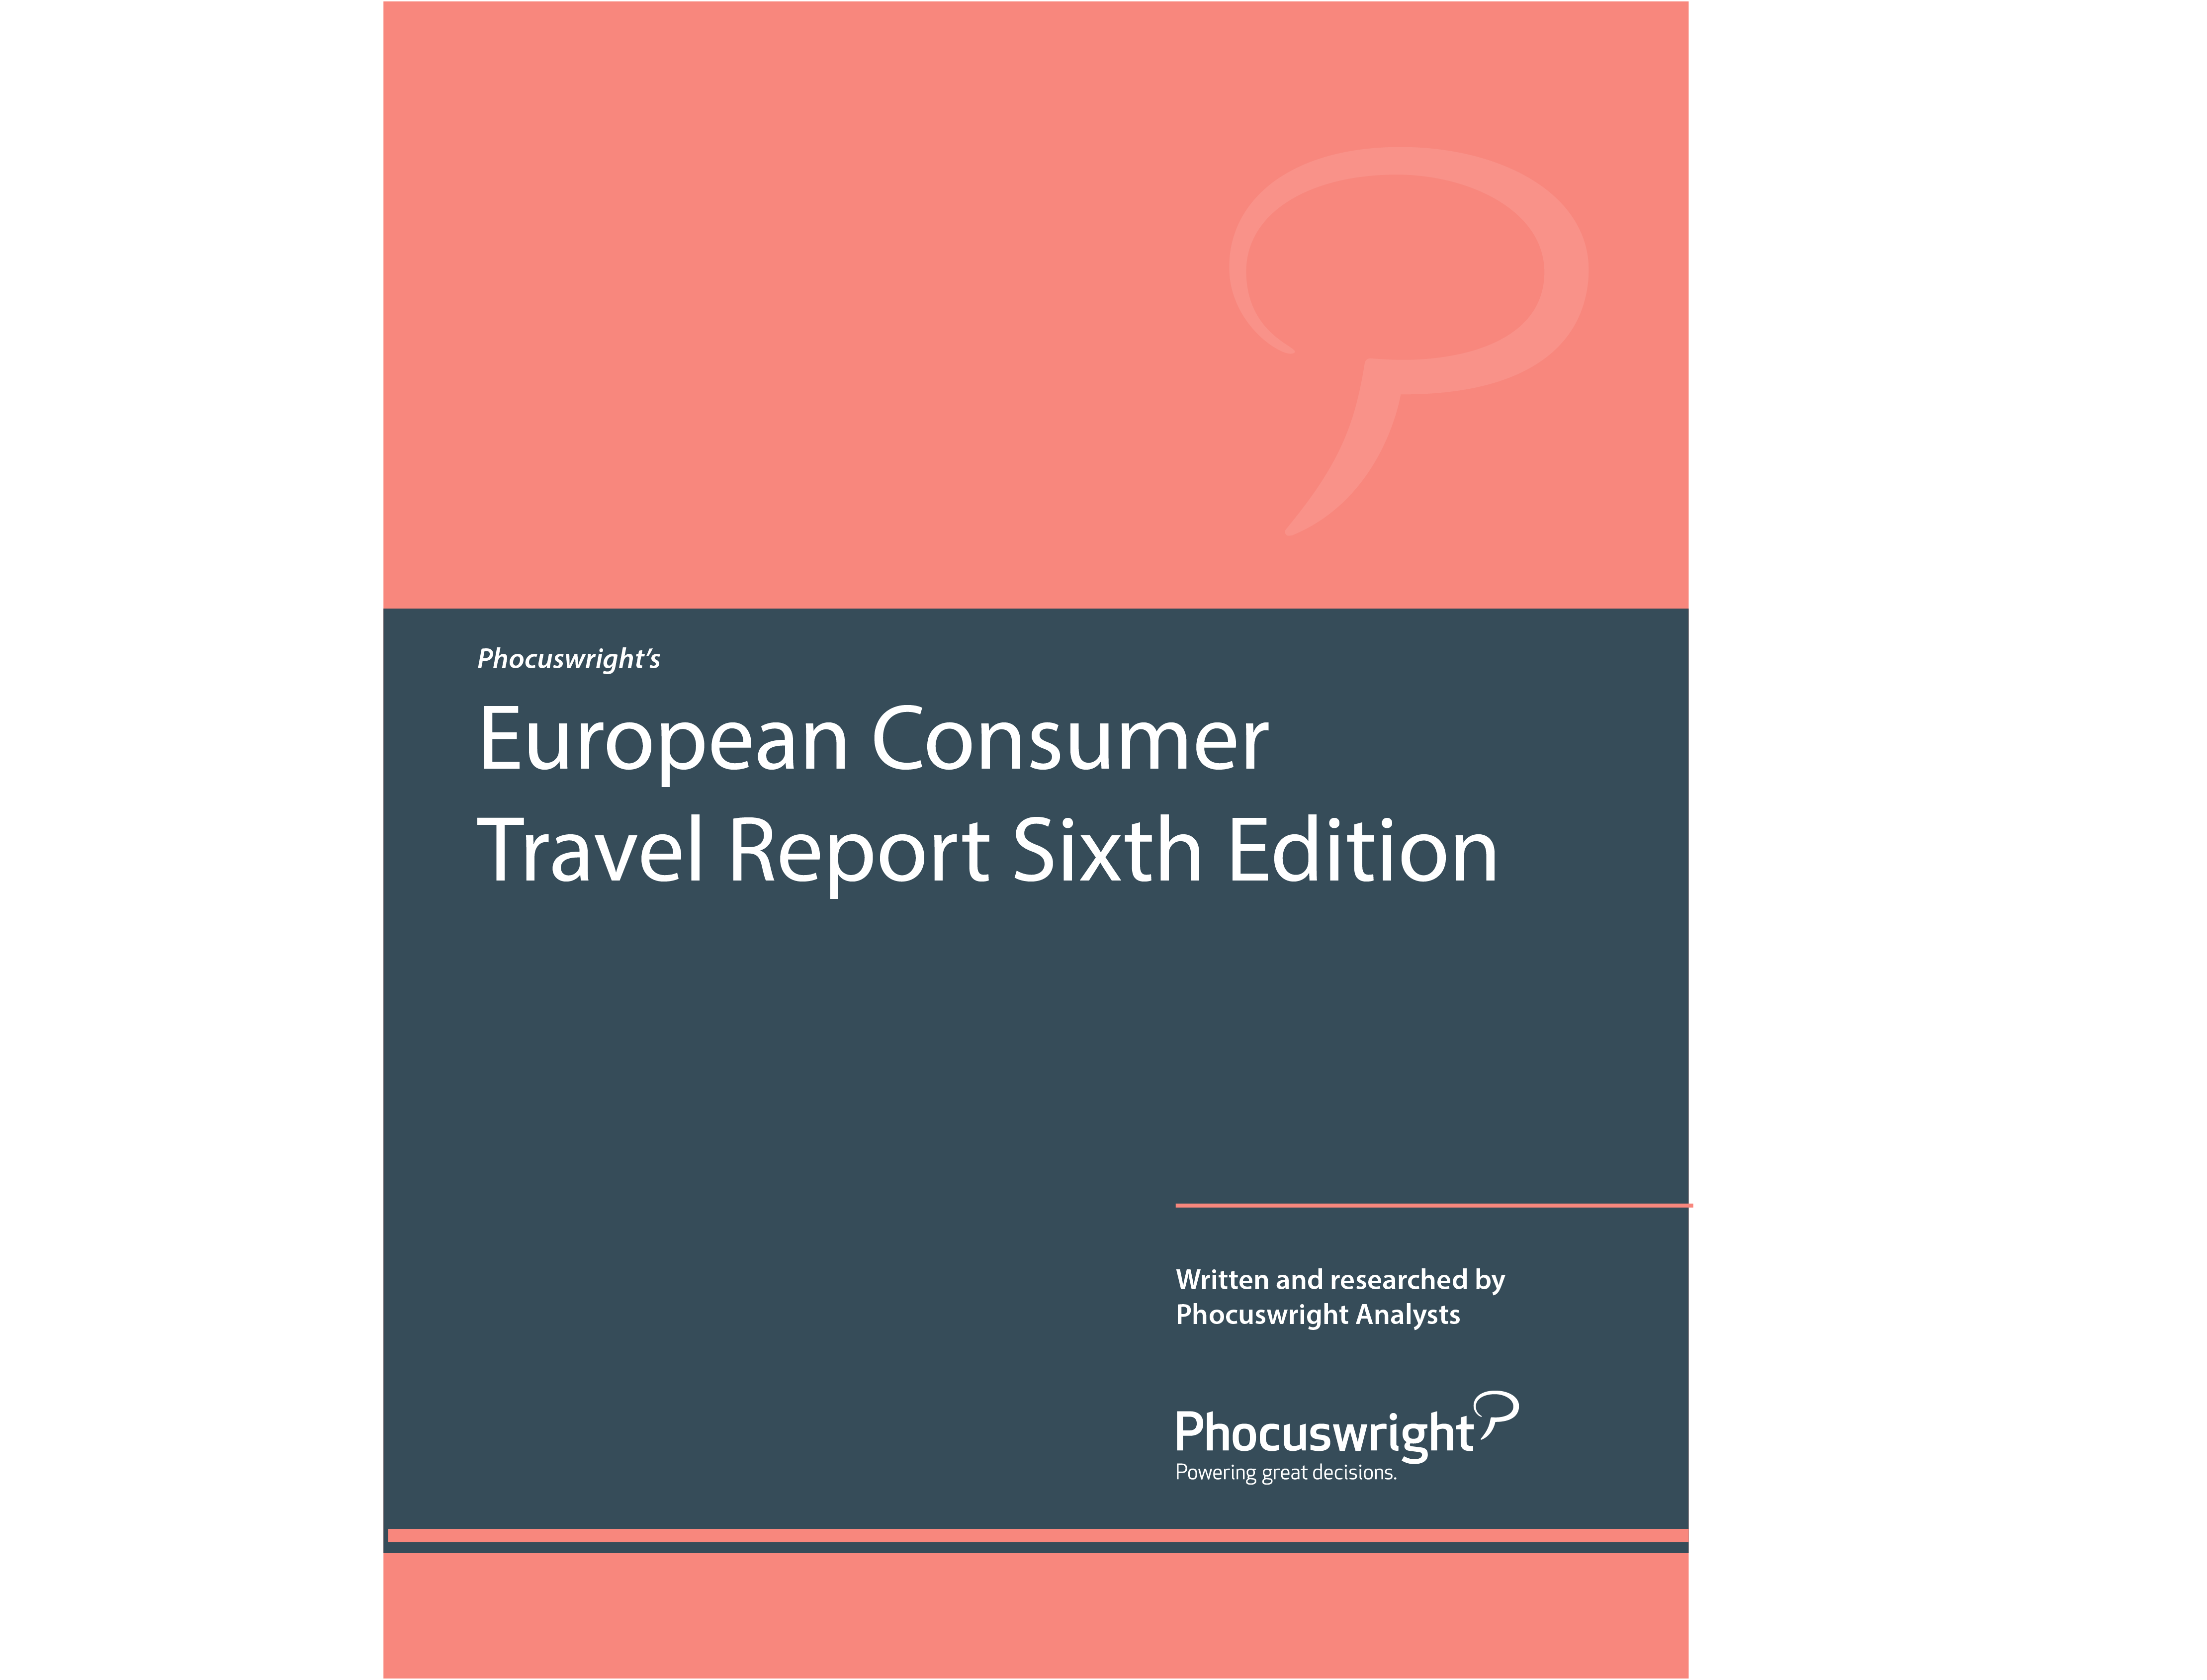 European Consumer Travel Report Sixth Edition